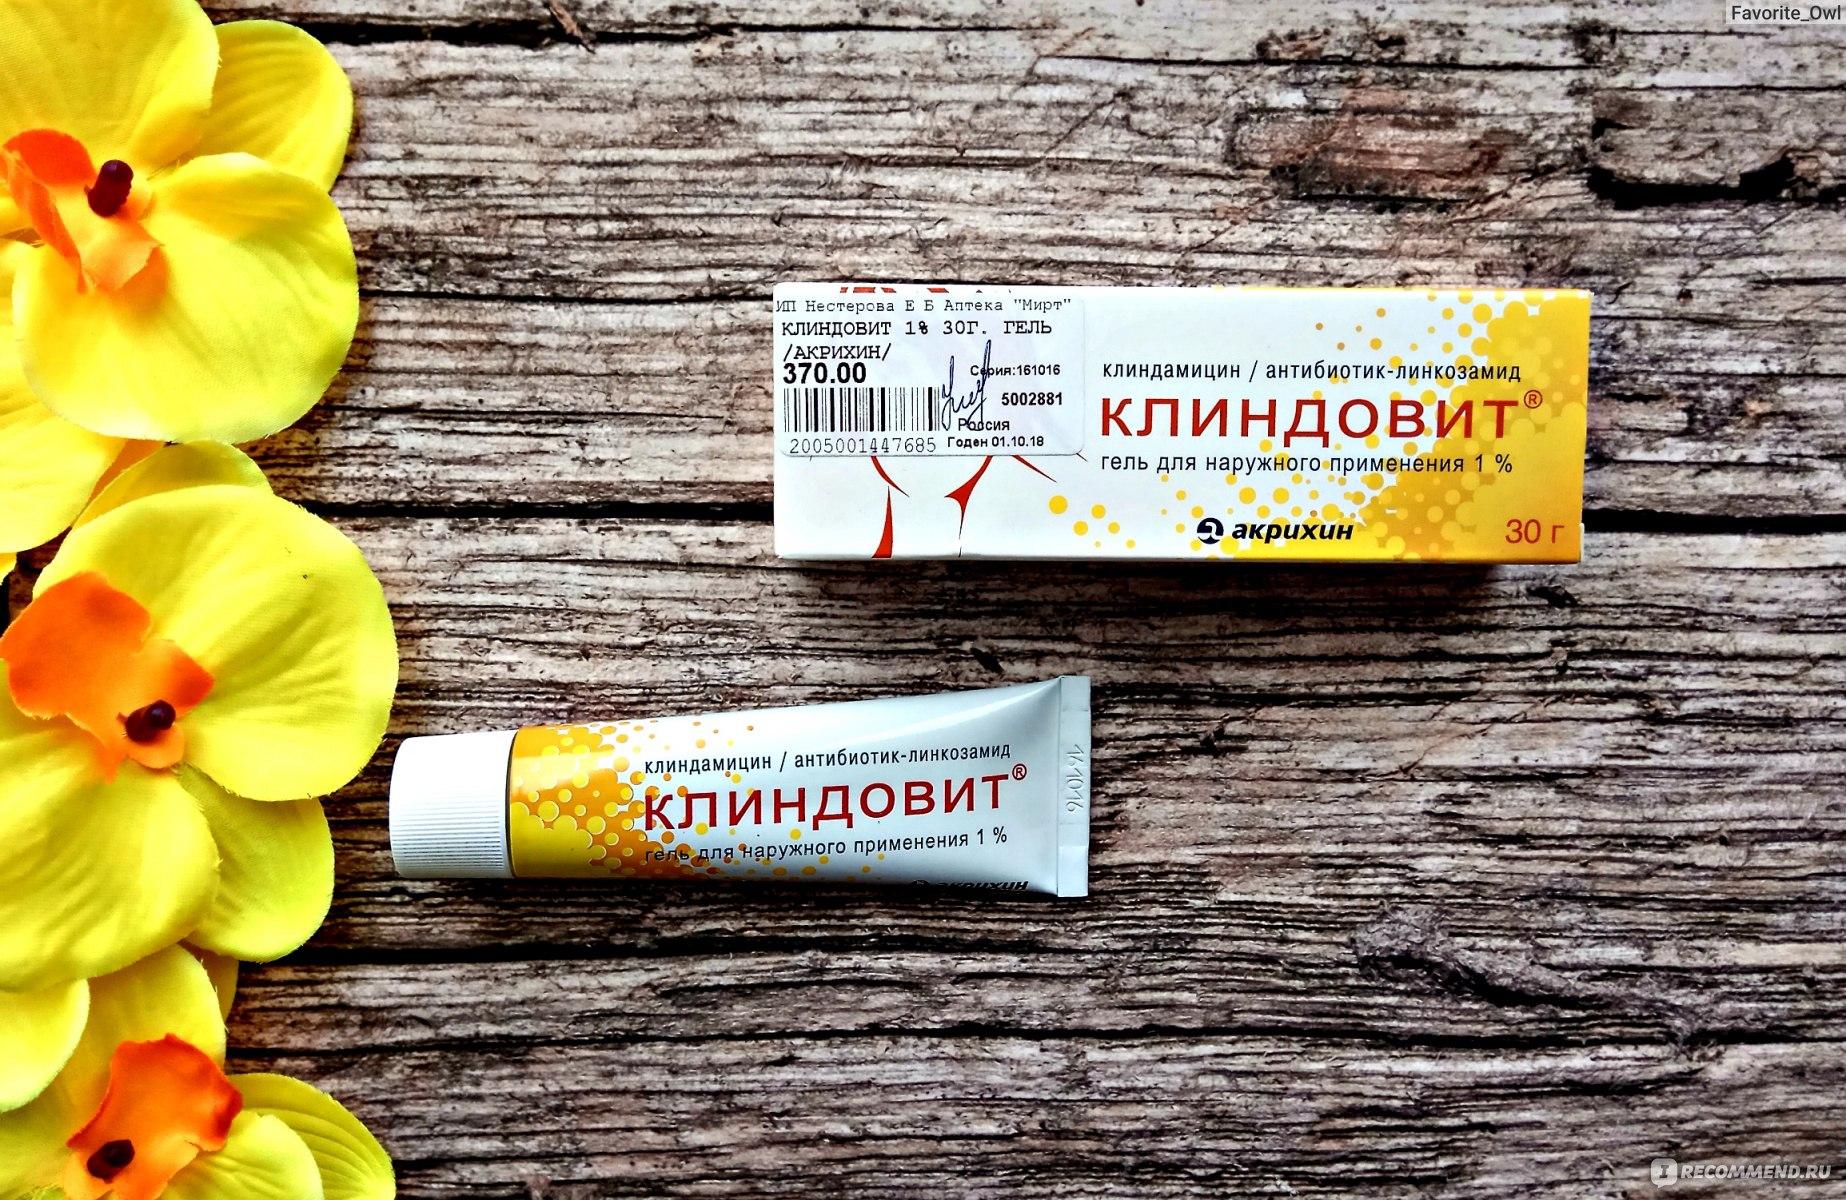 The drug Klindovit: reviews and description